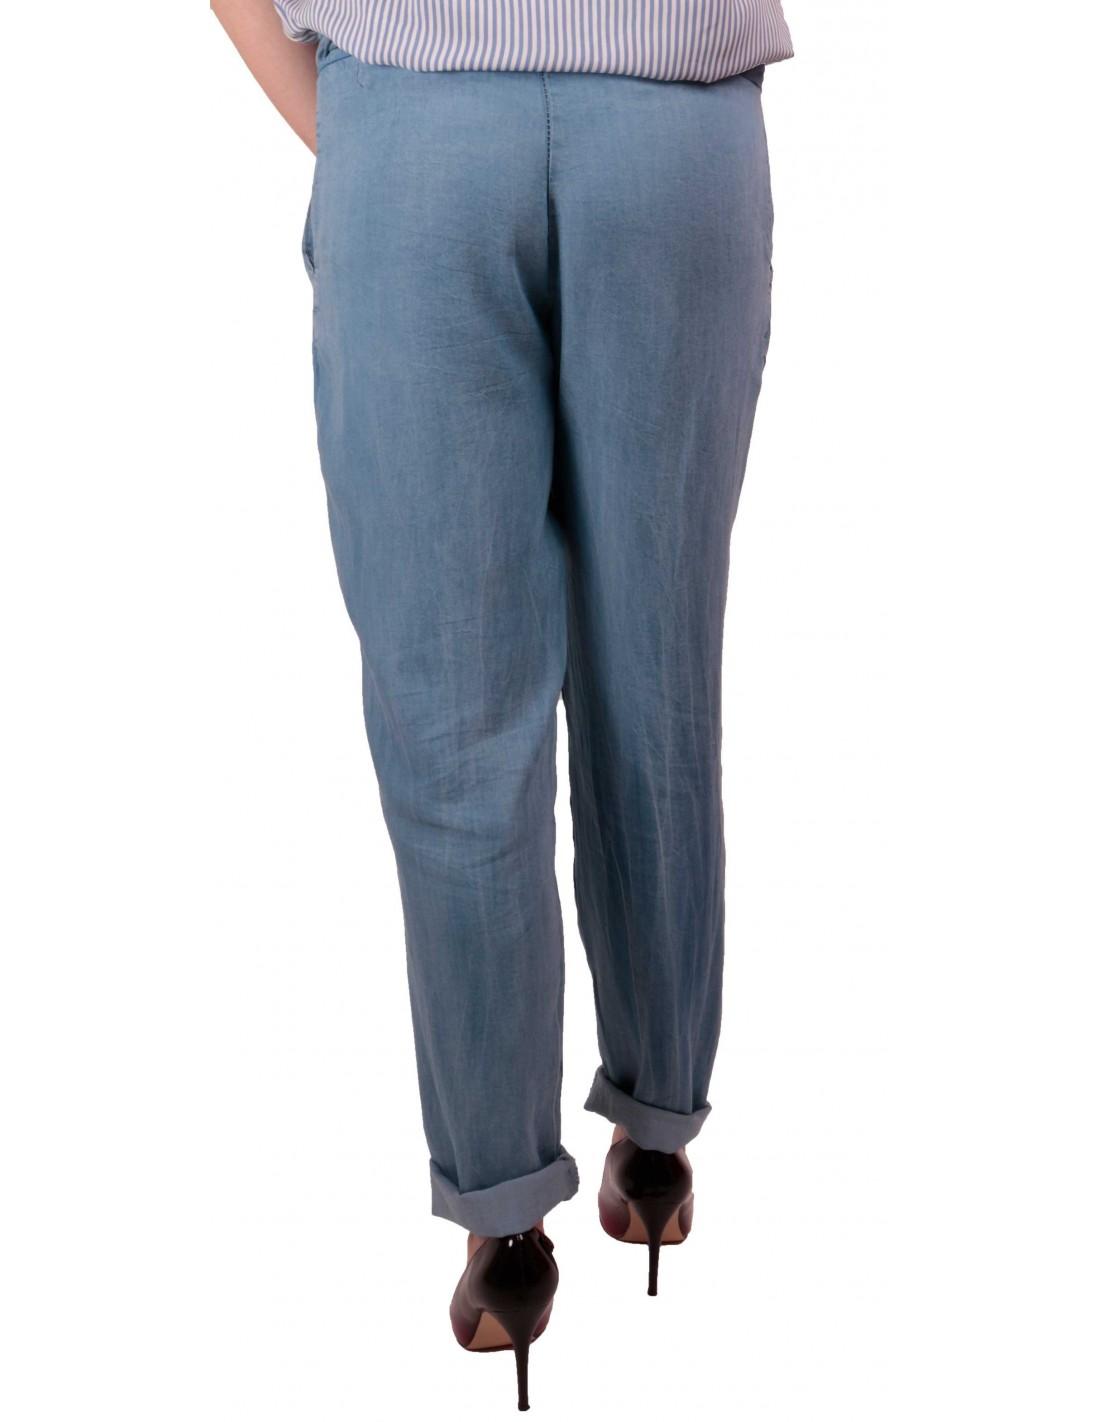 pantalon femme fluide jean clair taille lastique ceinture noeud. Black Bedroom Furniture Sets. Home Design Ideas